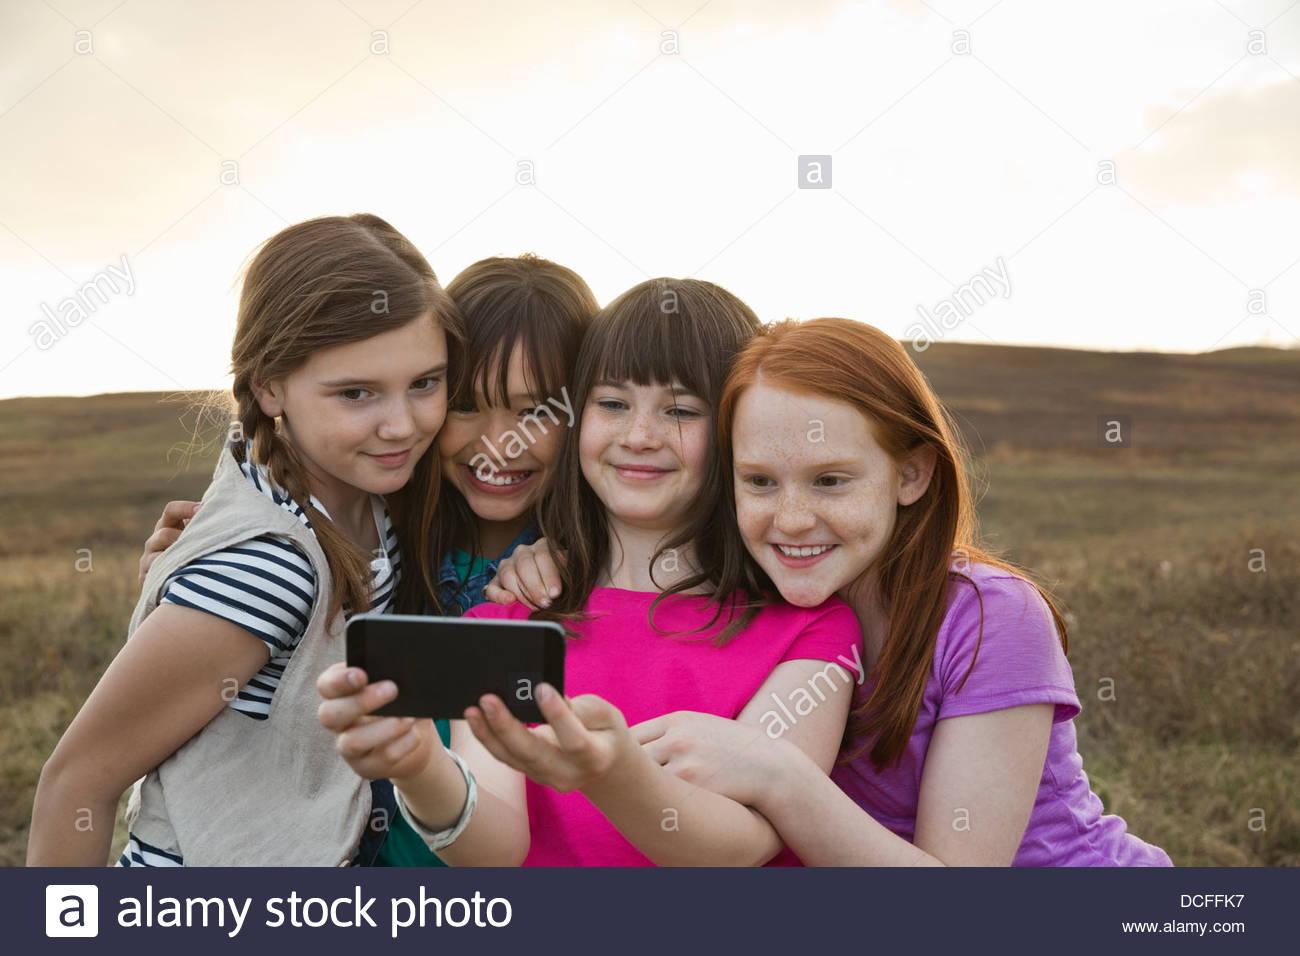 Smiling ecolières taking self-portrait outdoors Photo Stock